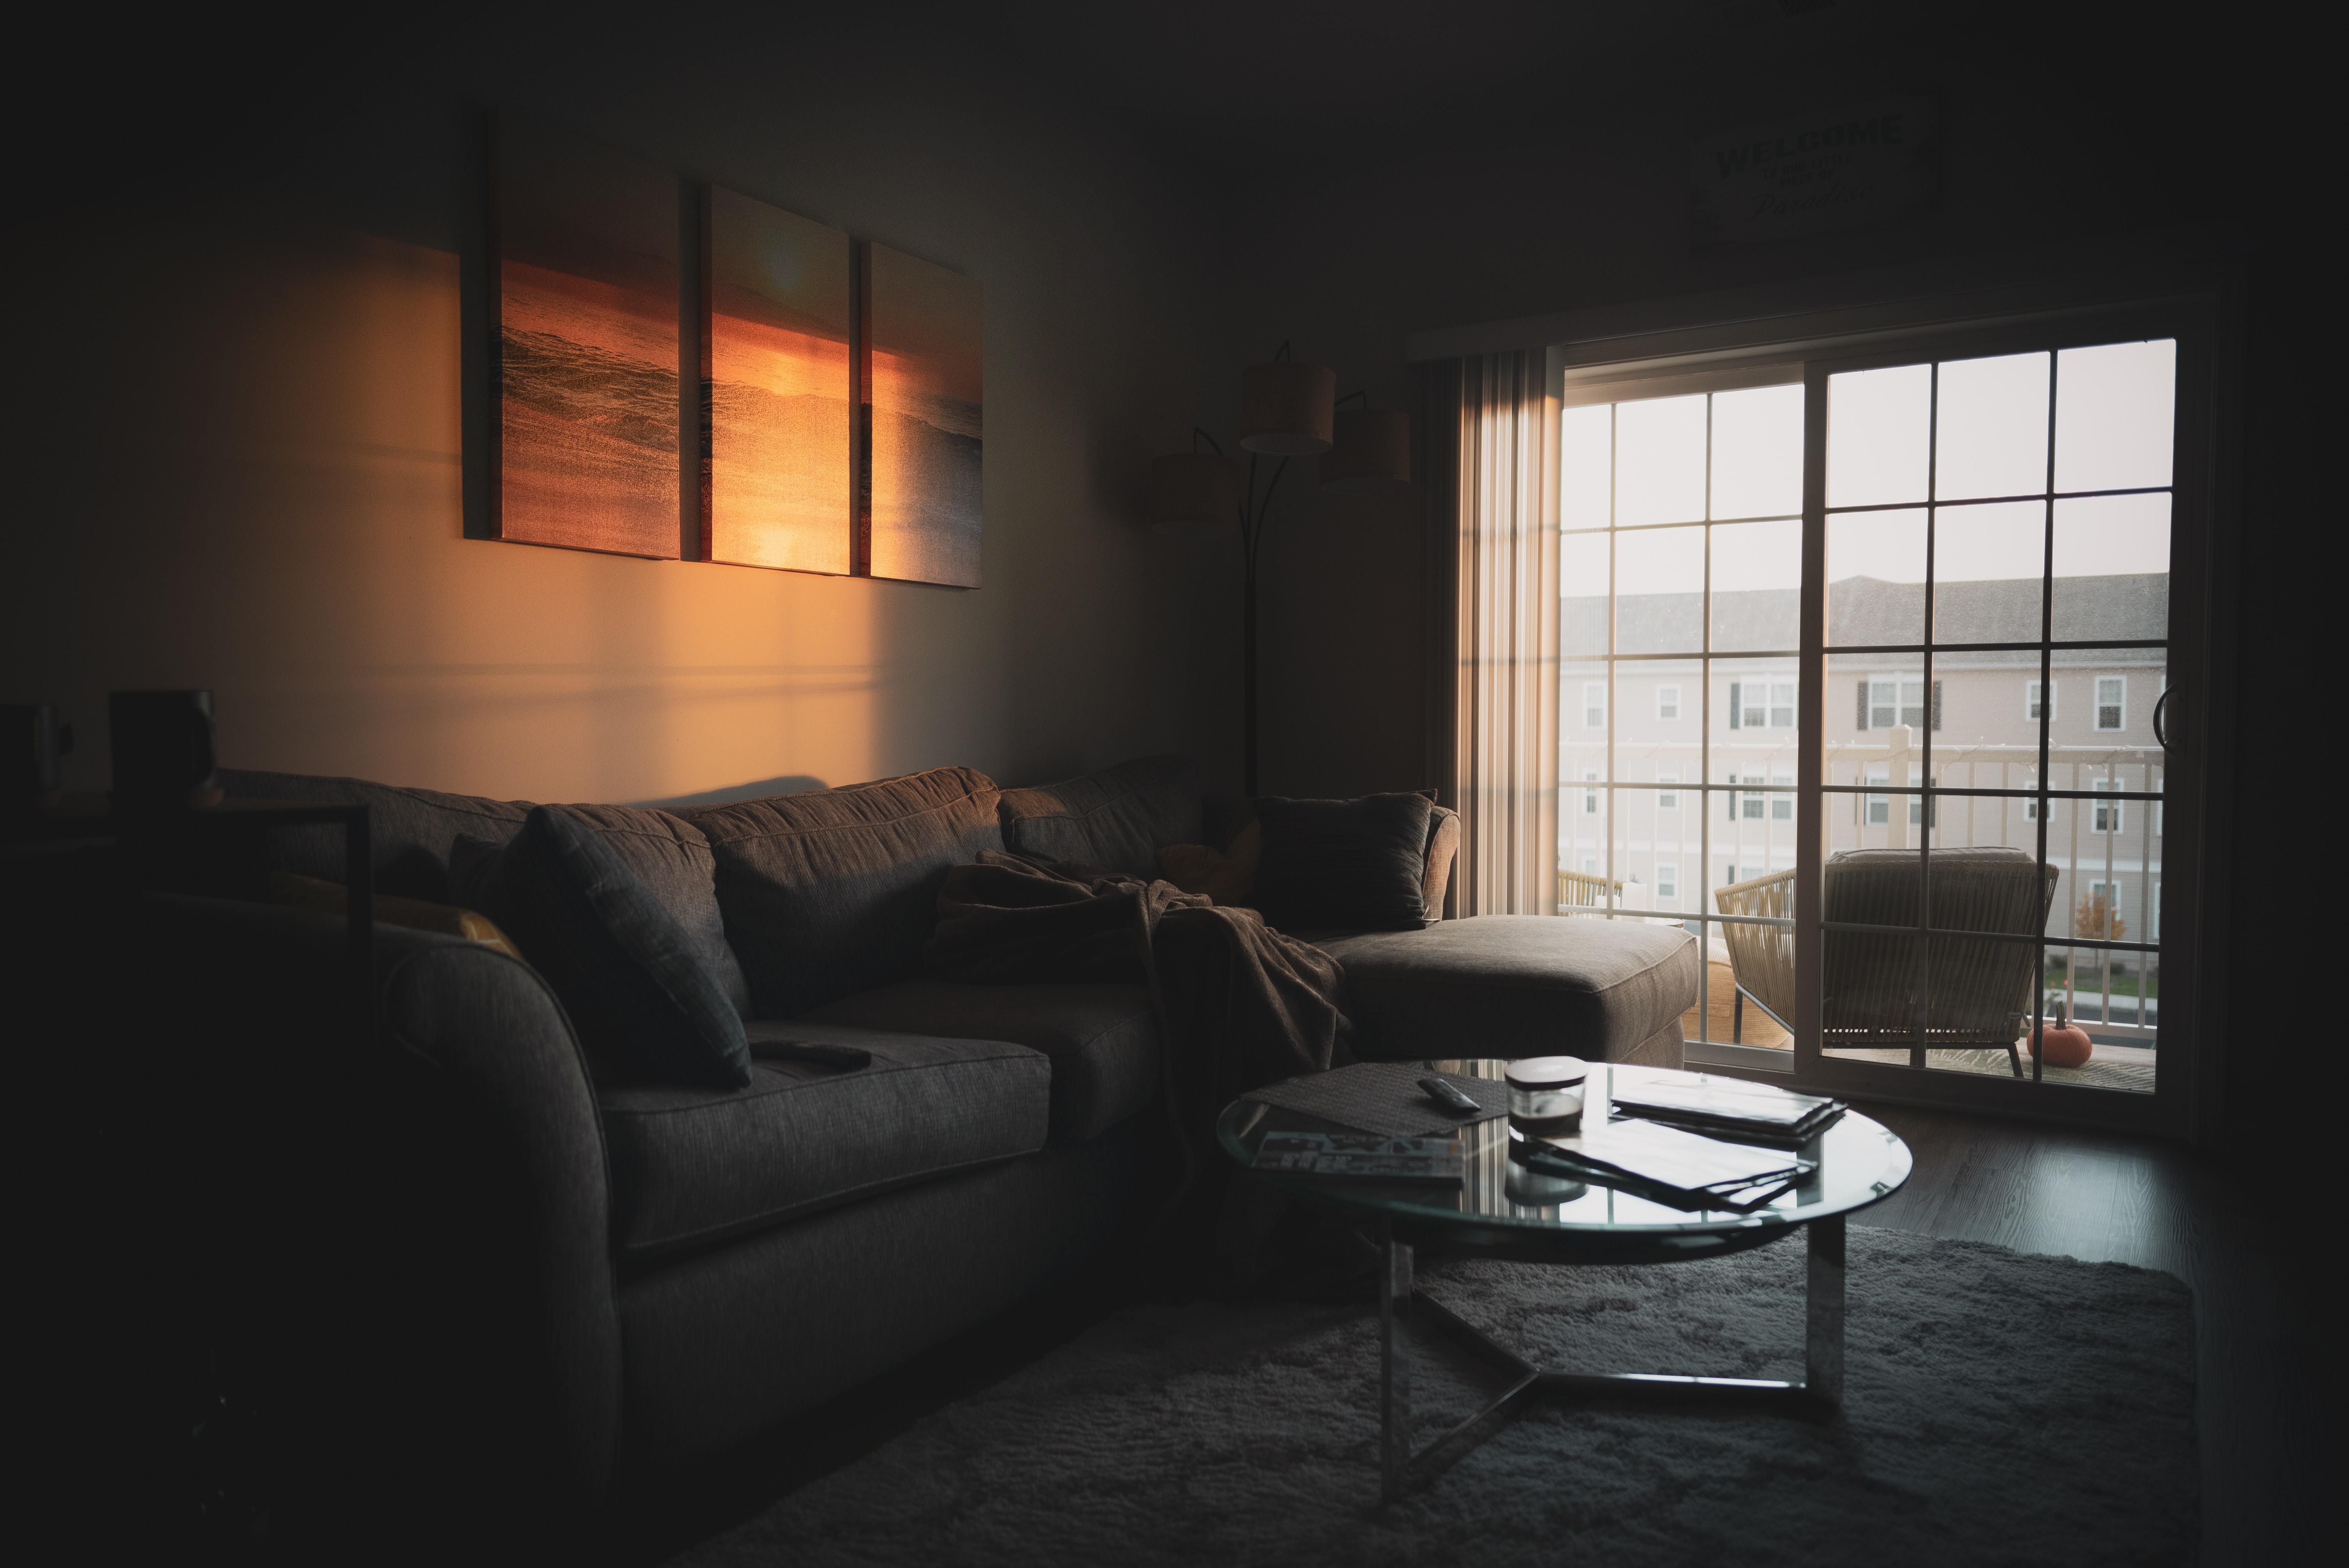 sectional sofa near coffee table and window